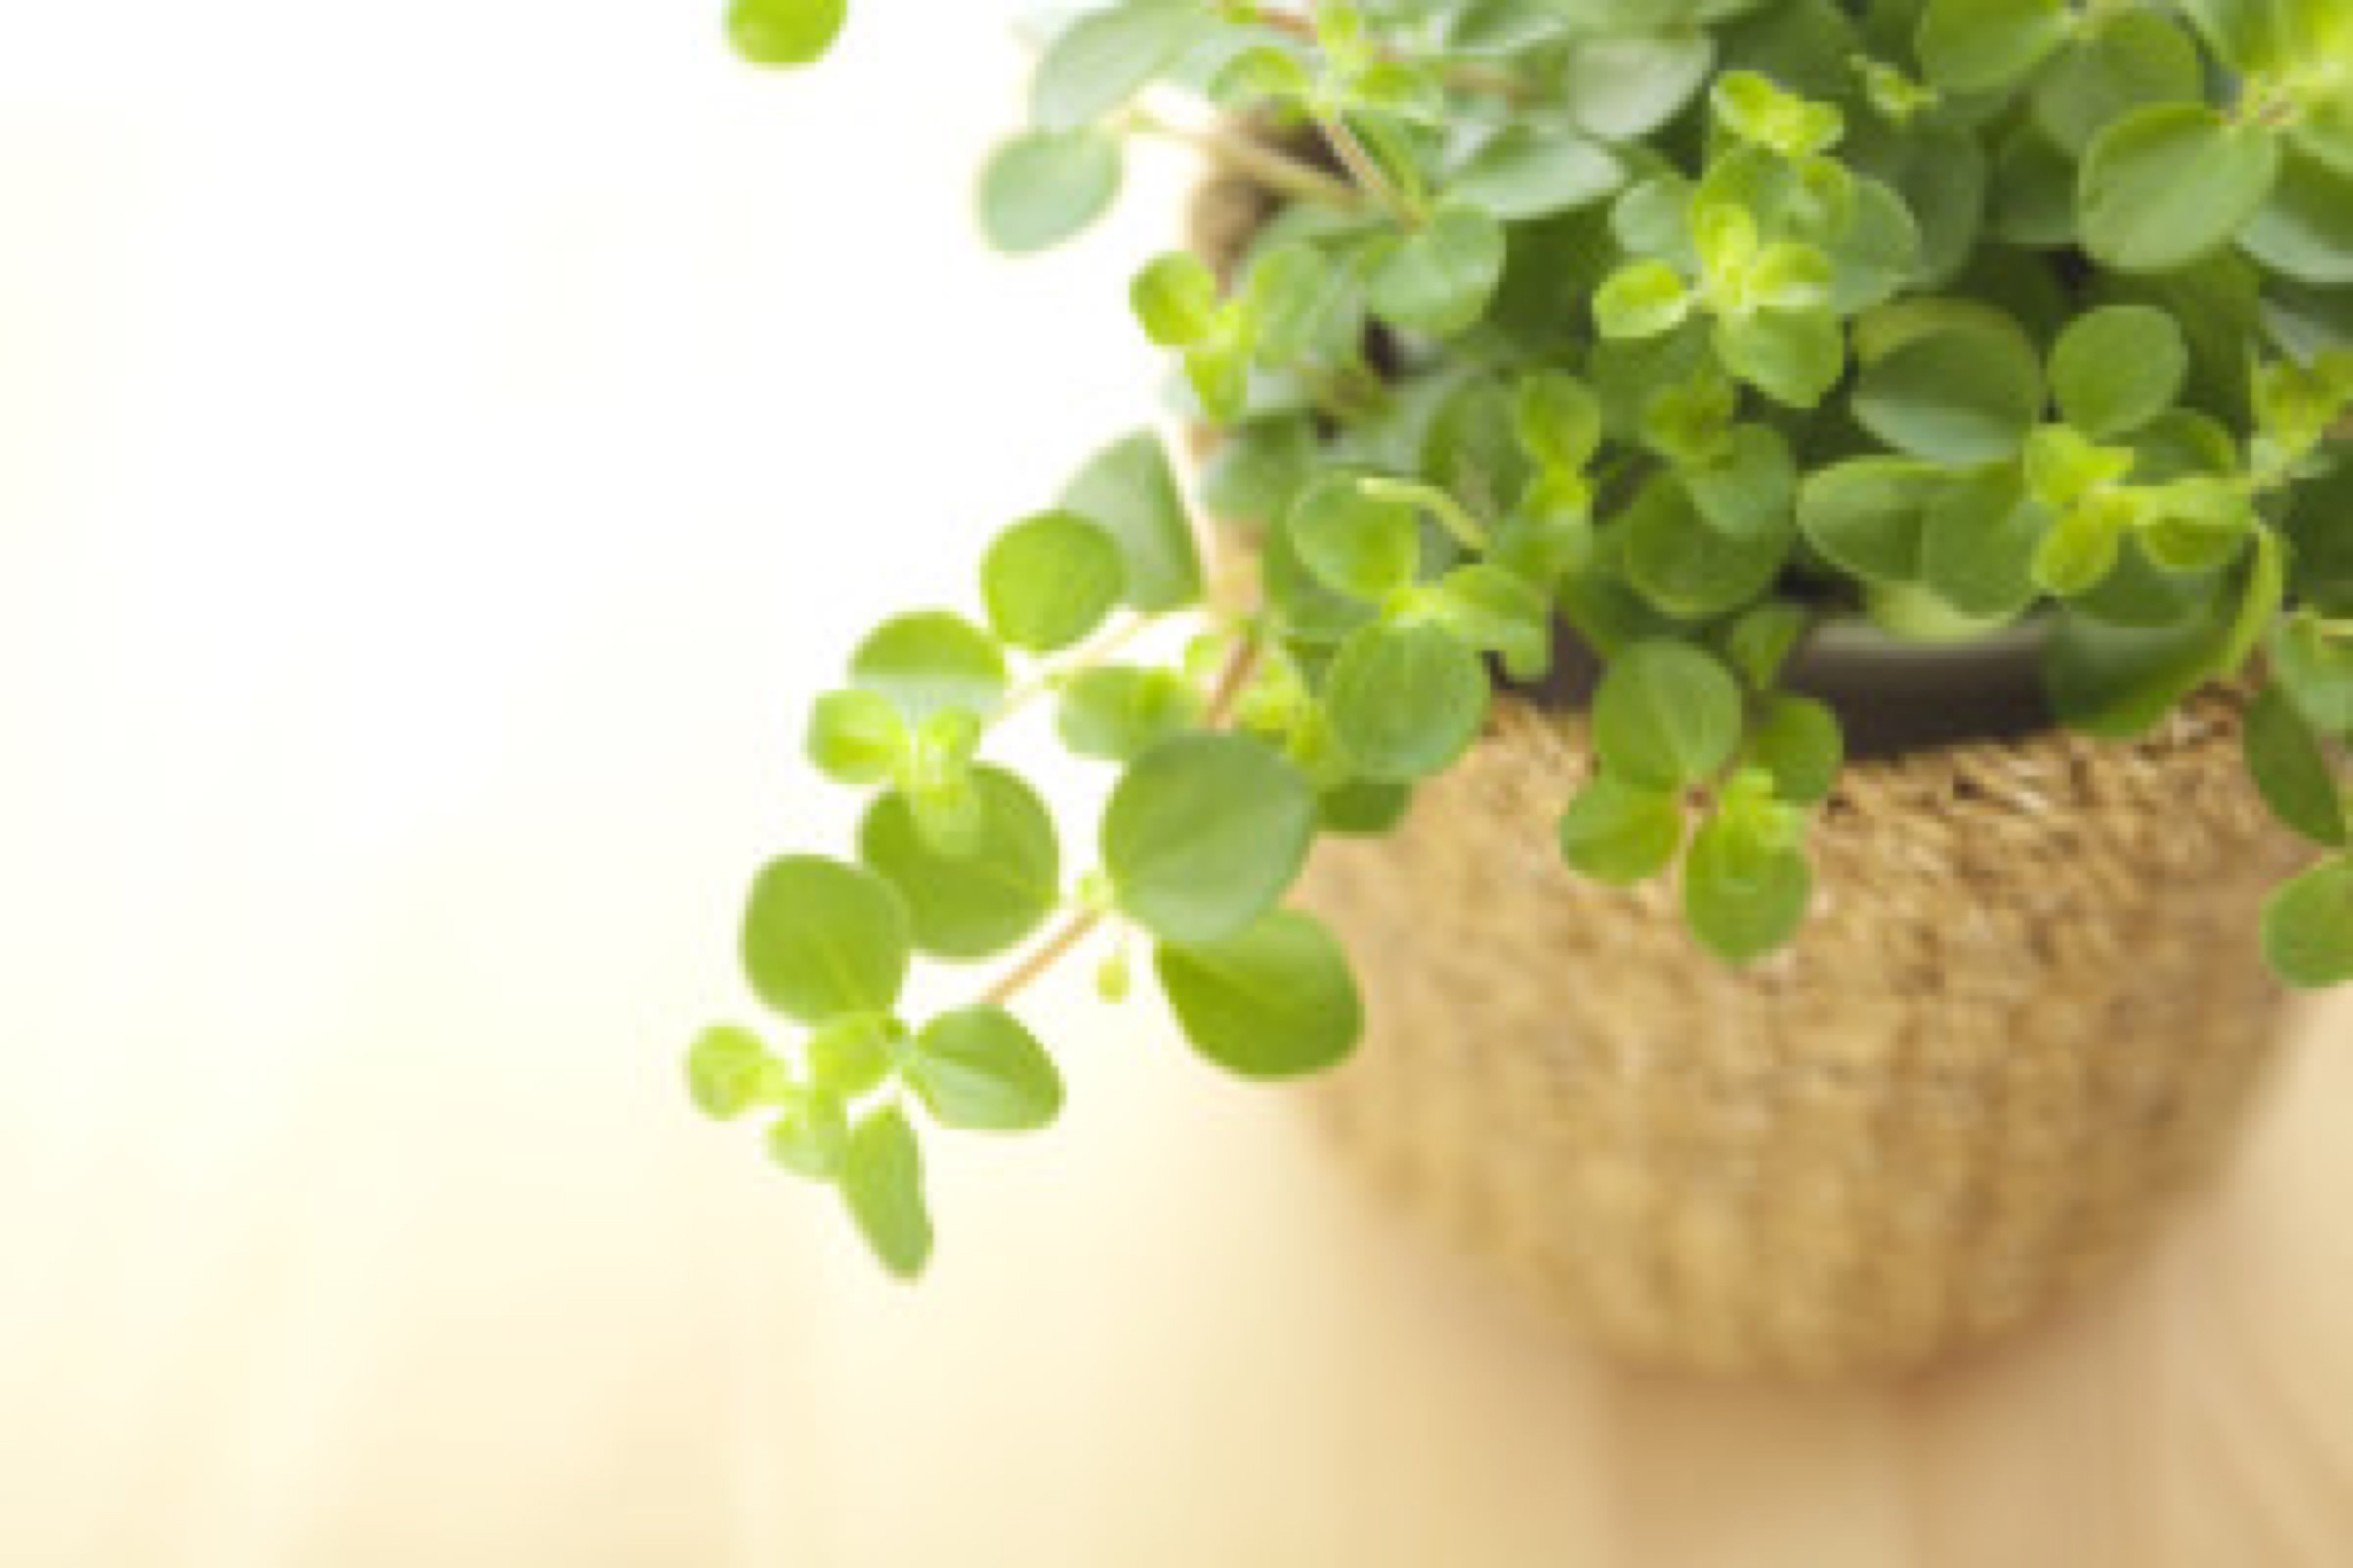 indoor plant (dollar paid)